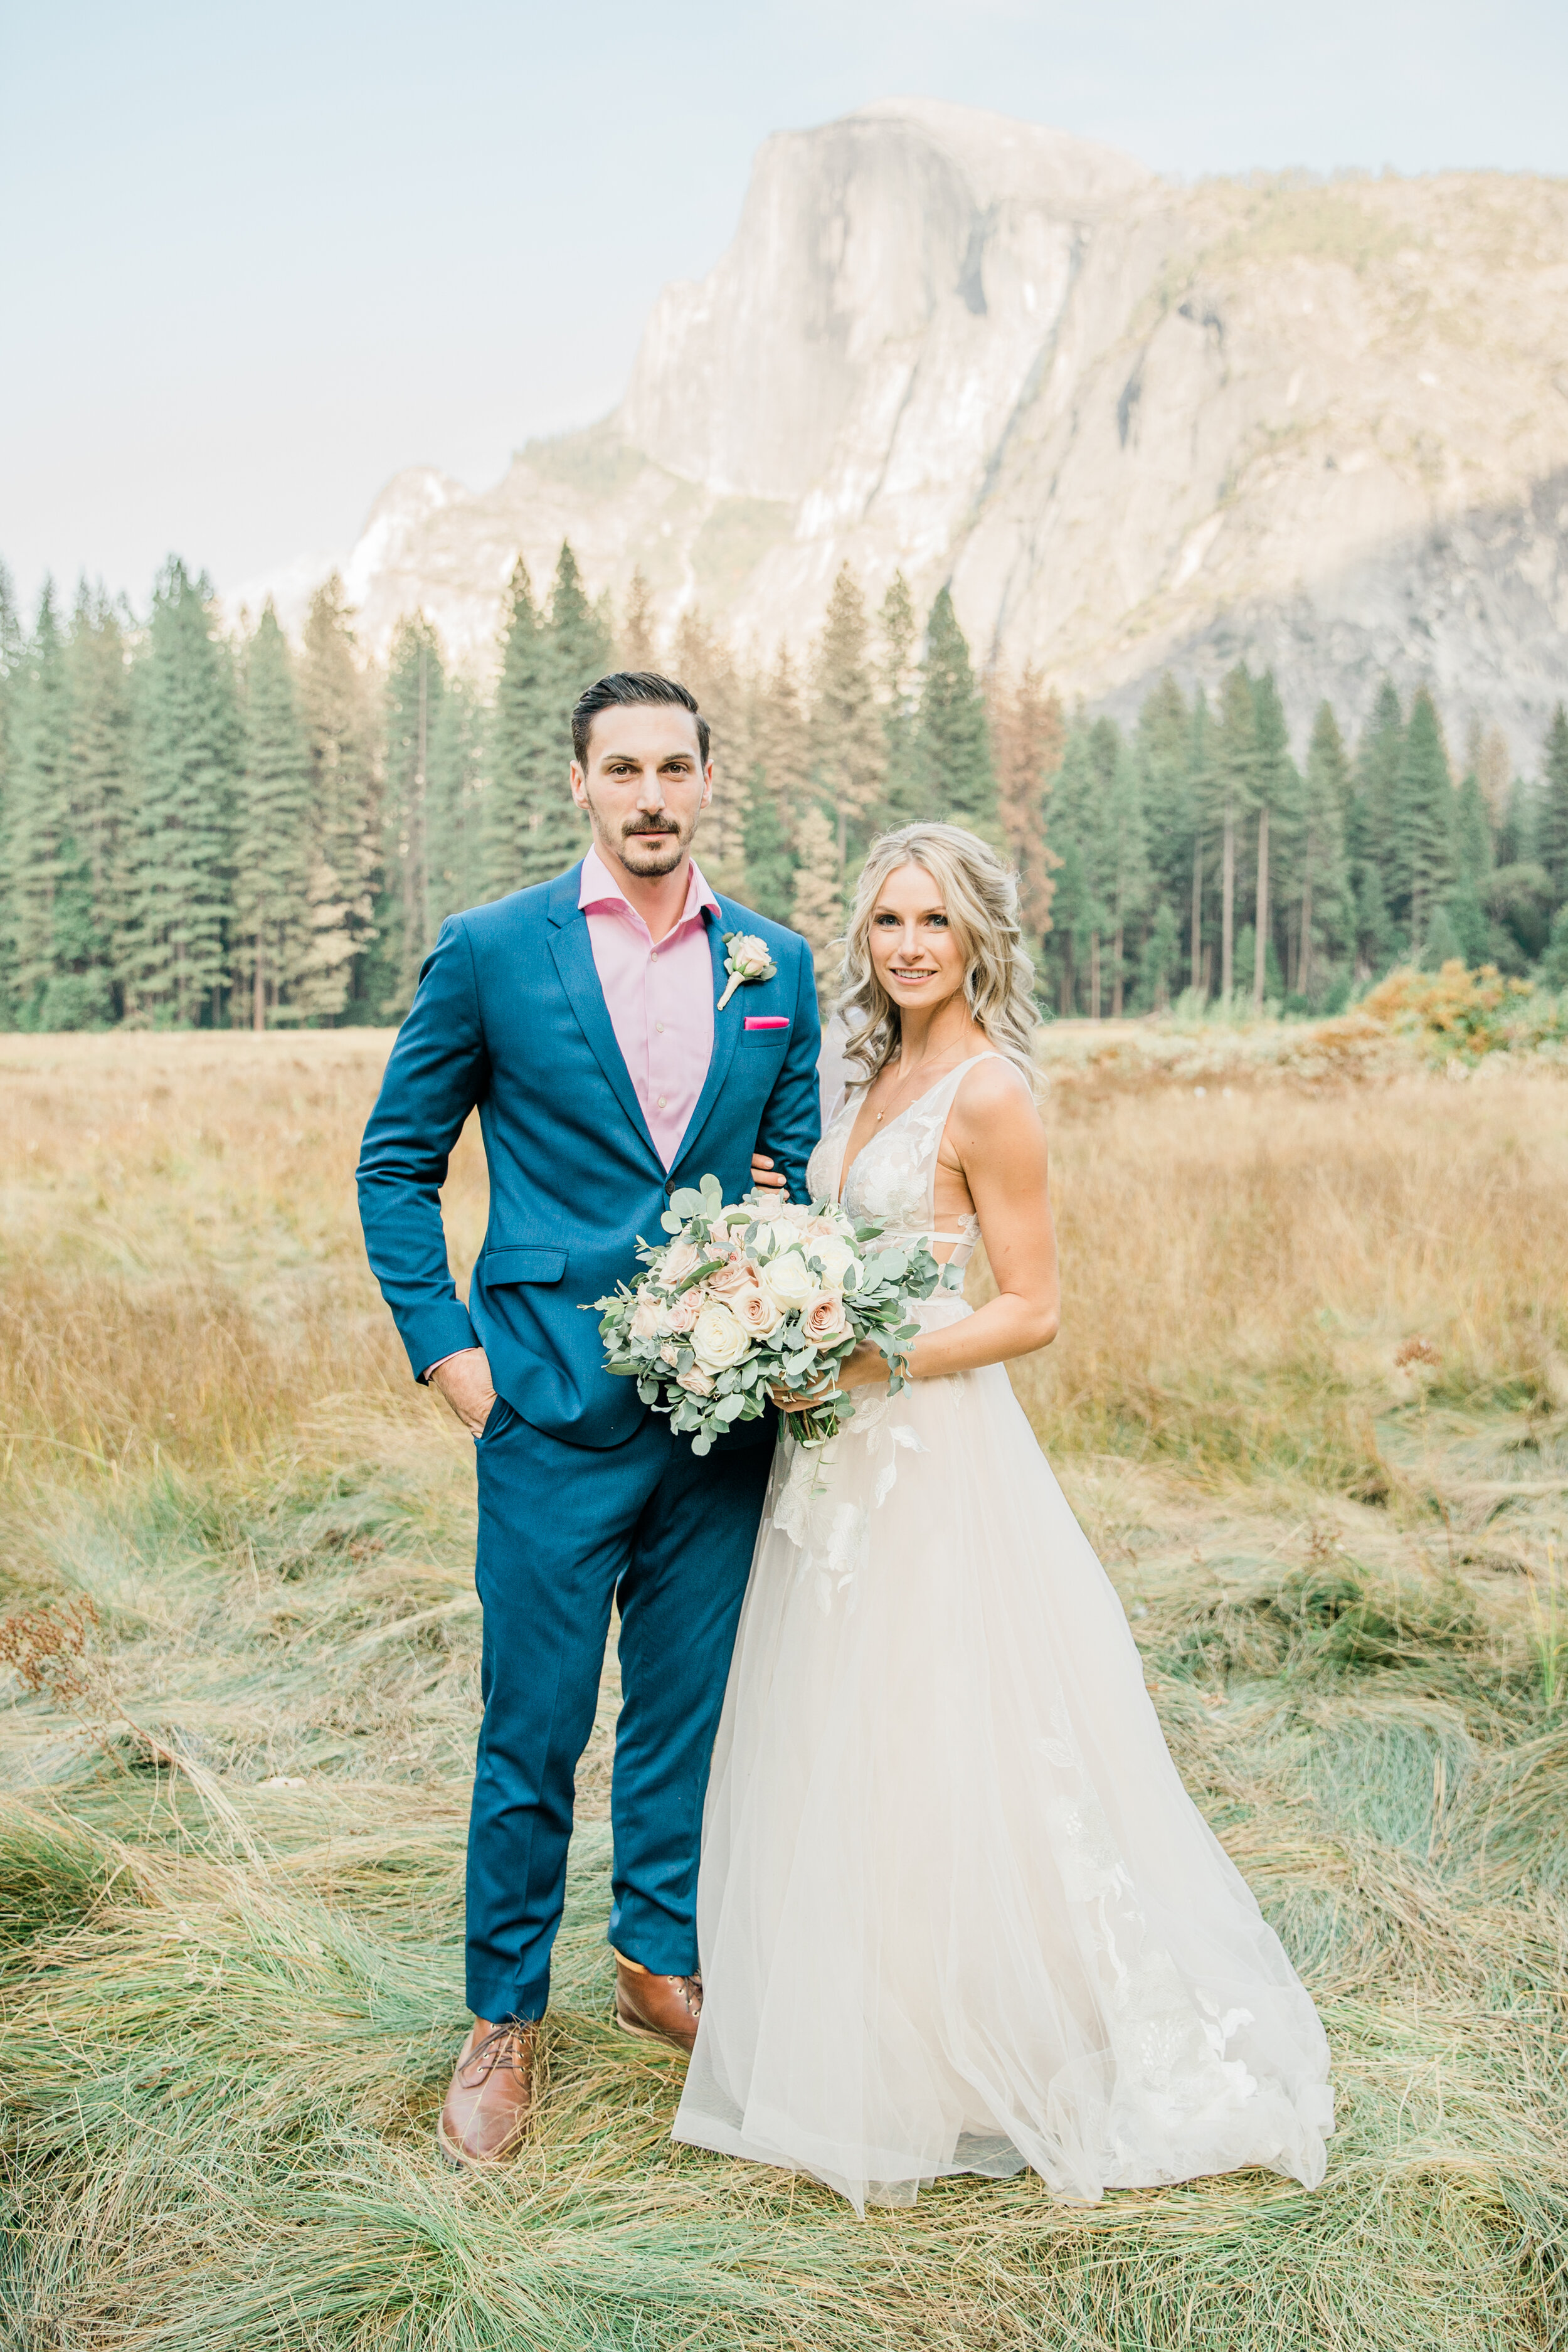 Leanne and Joe - Married - Sneak Peeks - Lauren Alisse Photography-33.jpg